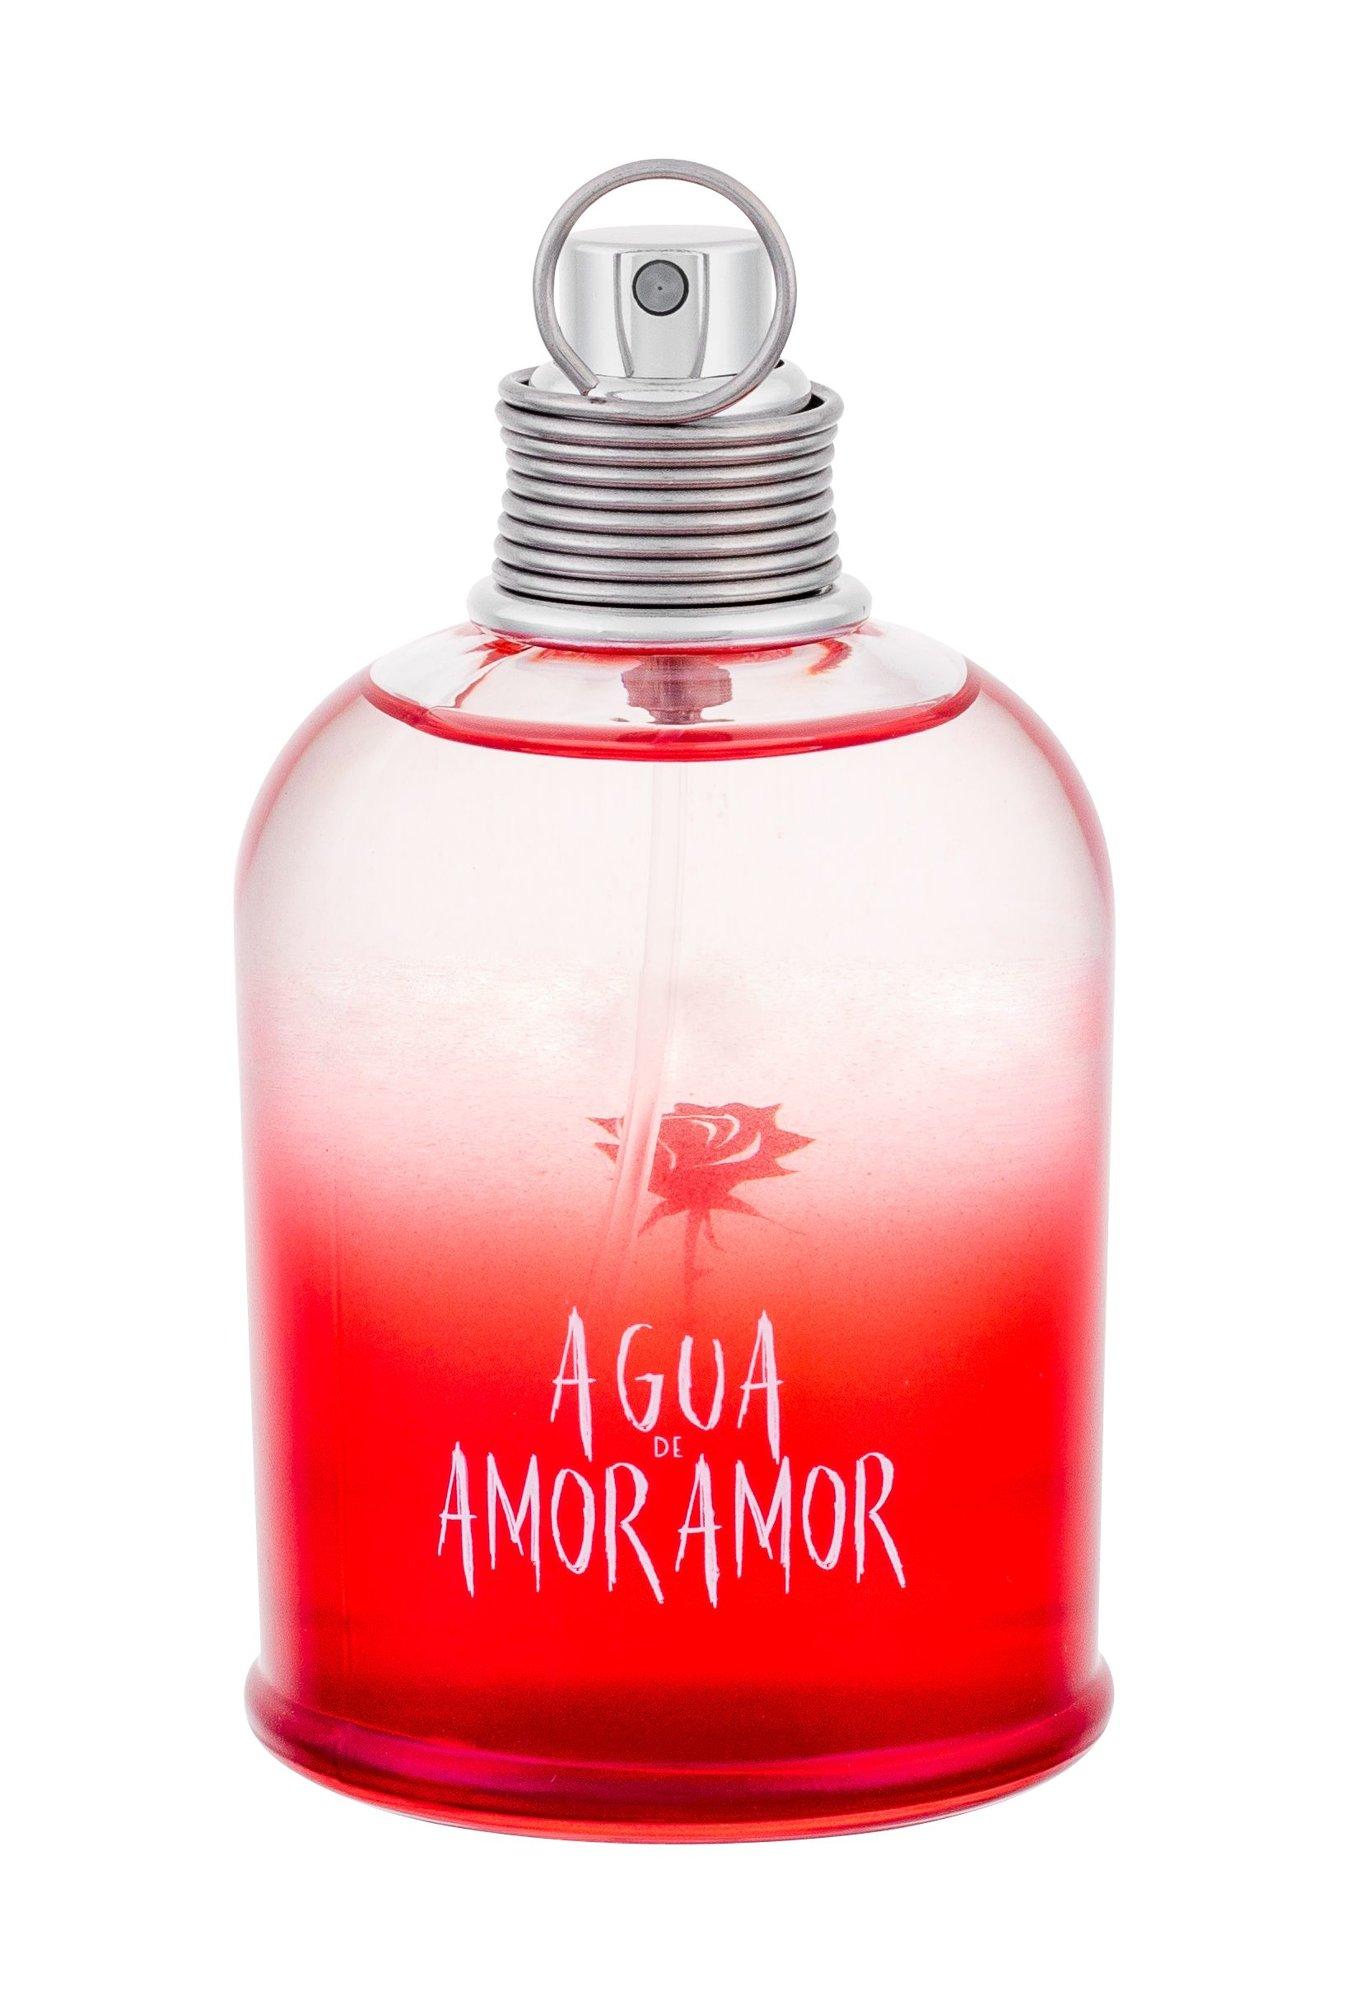 Cacharel Agua de Amor Amor Eau de Toilette 100ml